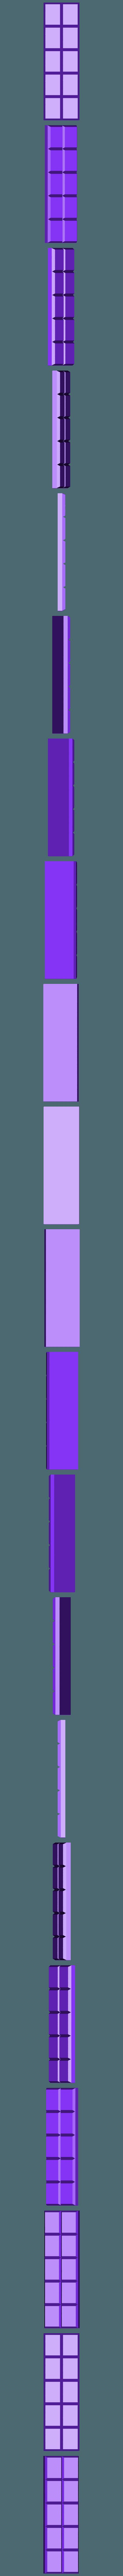 5_2.stl Download STL file Chocolate Bar Puzzle • 3D print design, mtairymd